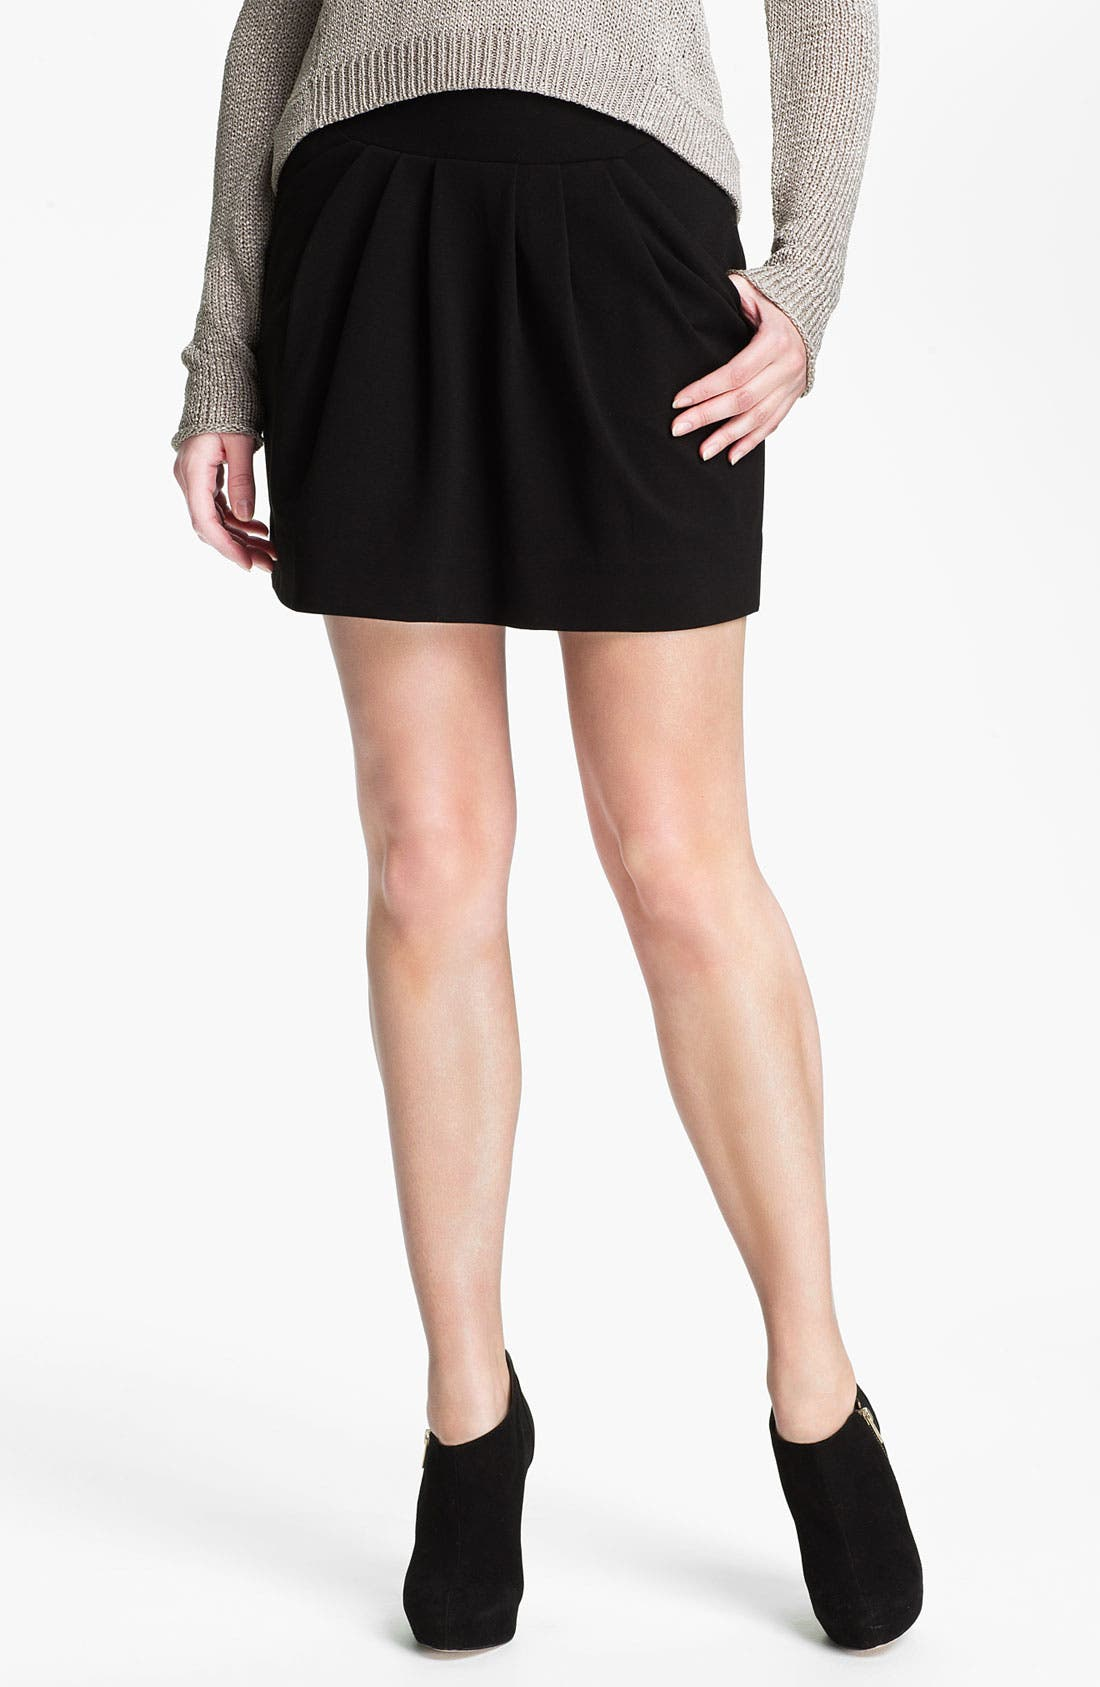 Alternate Image 1 Selected - Diane von Furstenberg 'Jan' Skirt